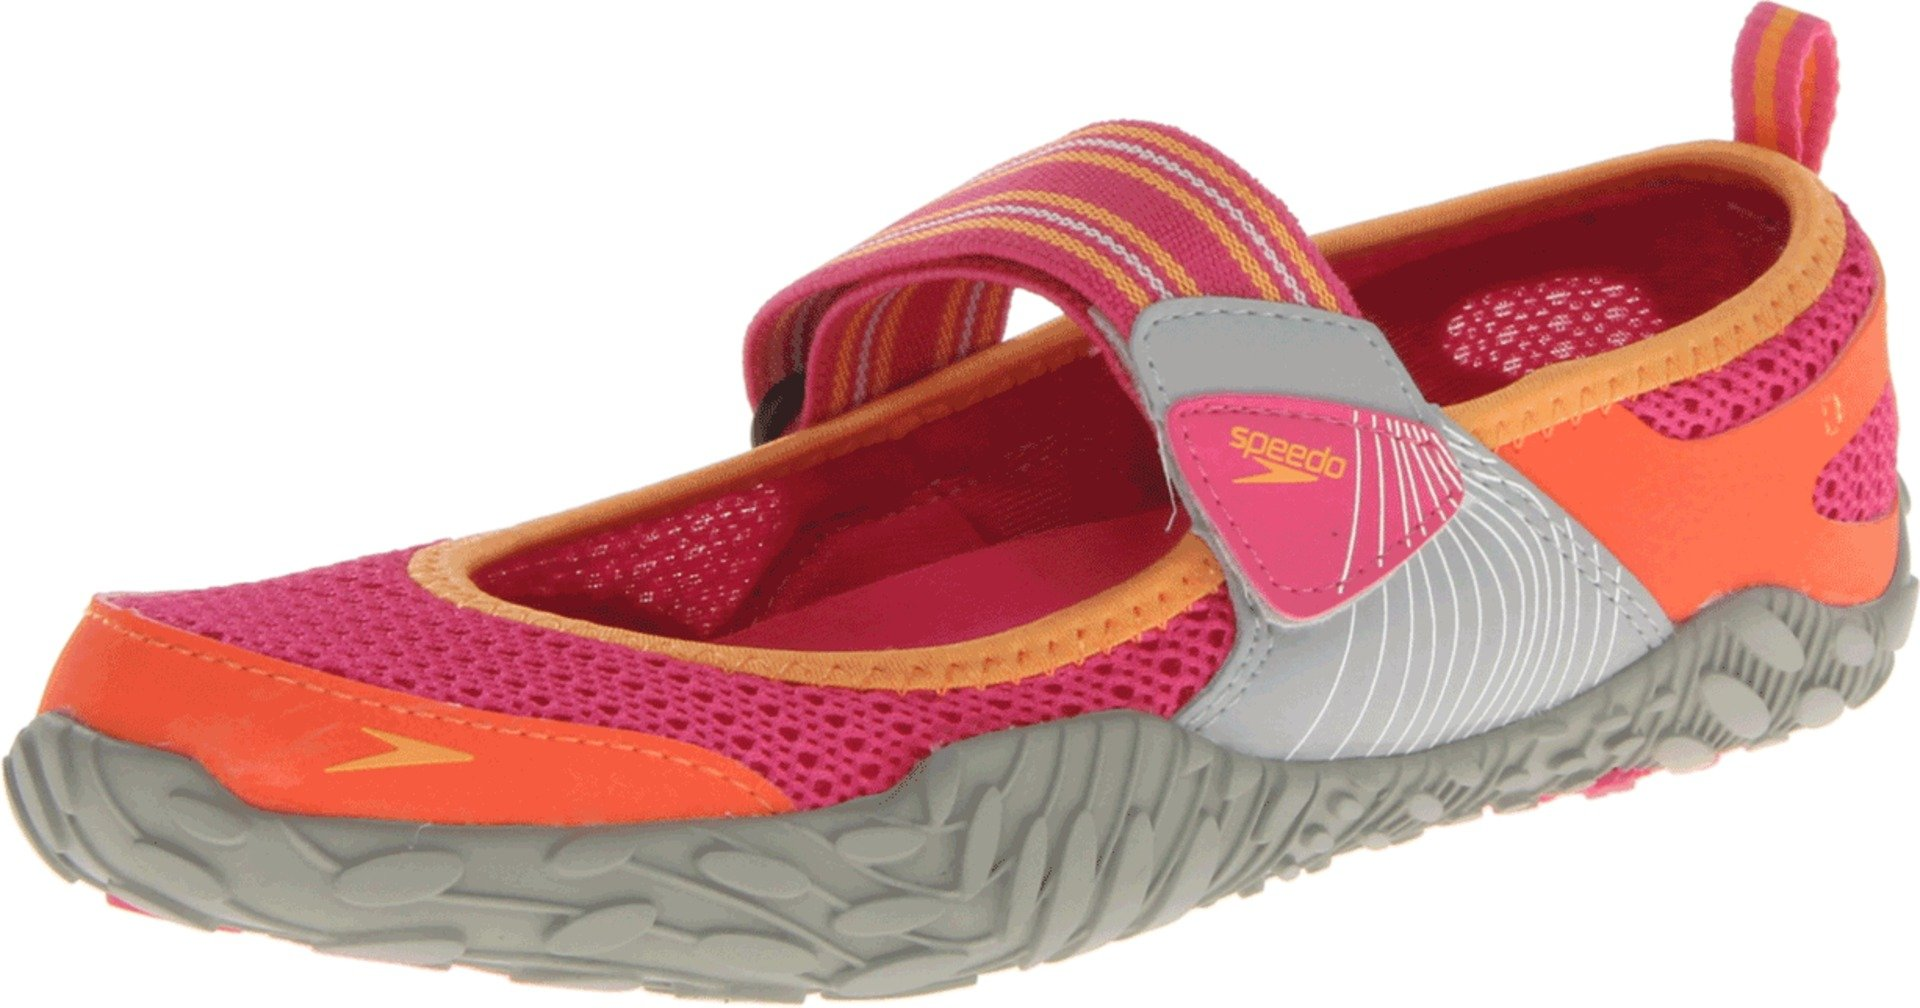 Speedo Women's Offshore Amphibious Water Shoe